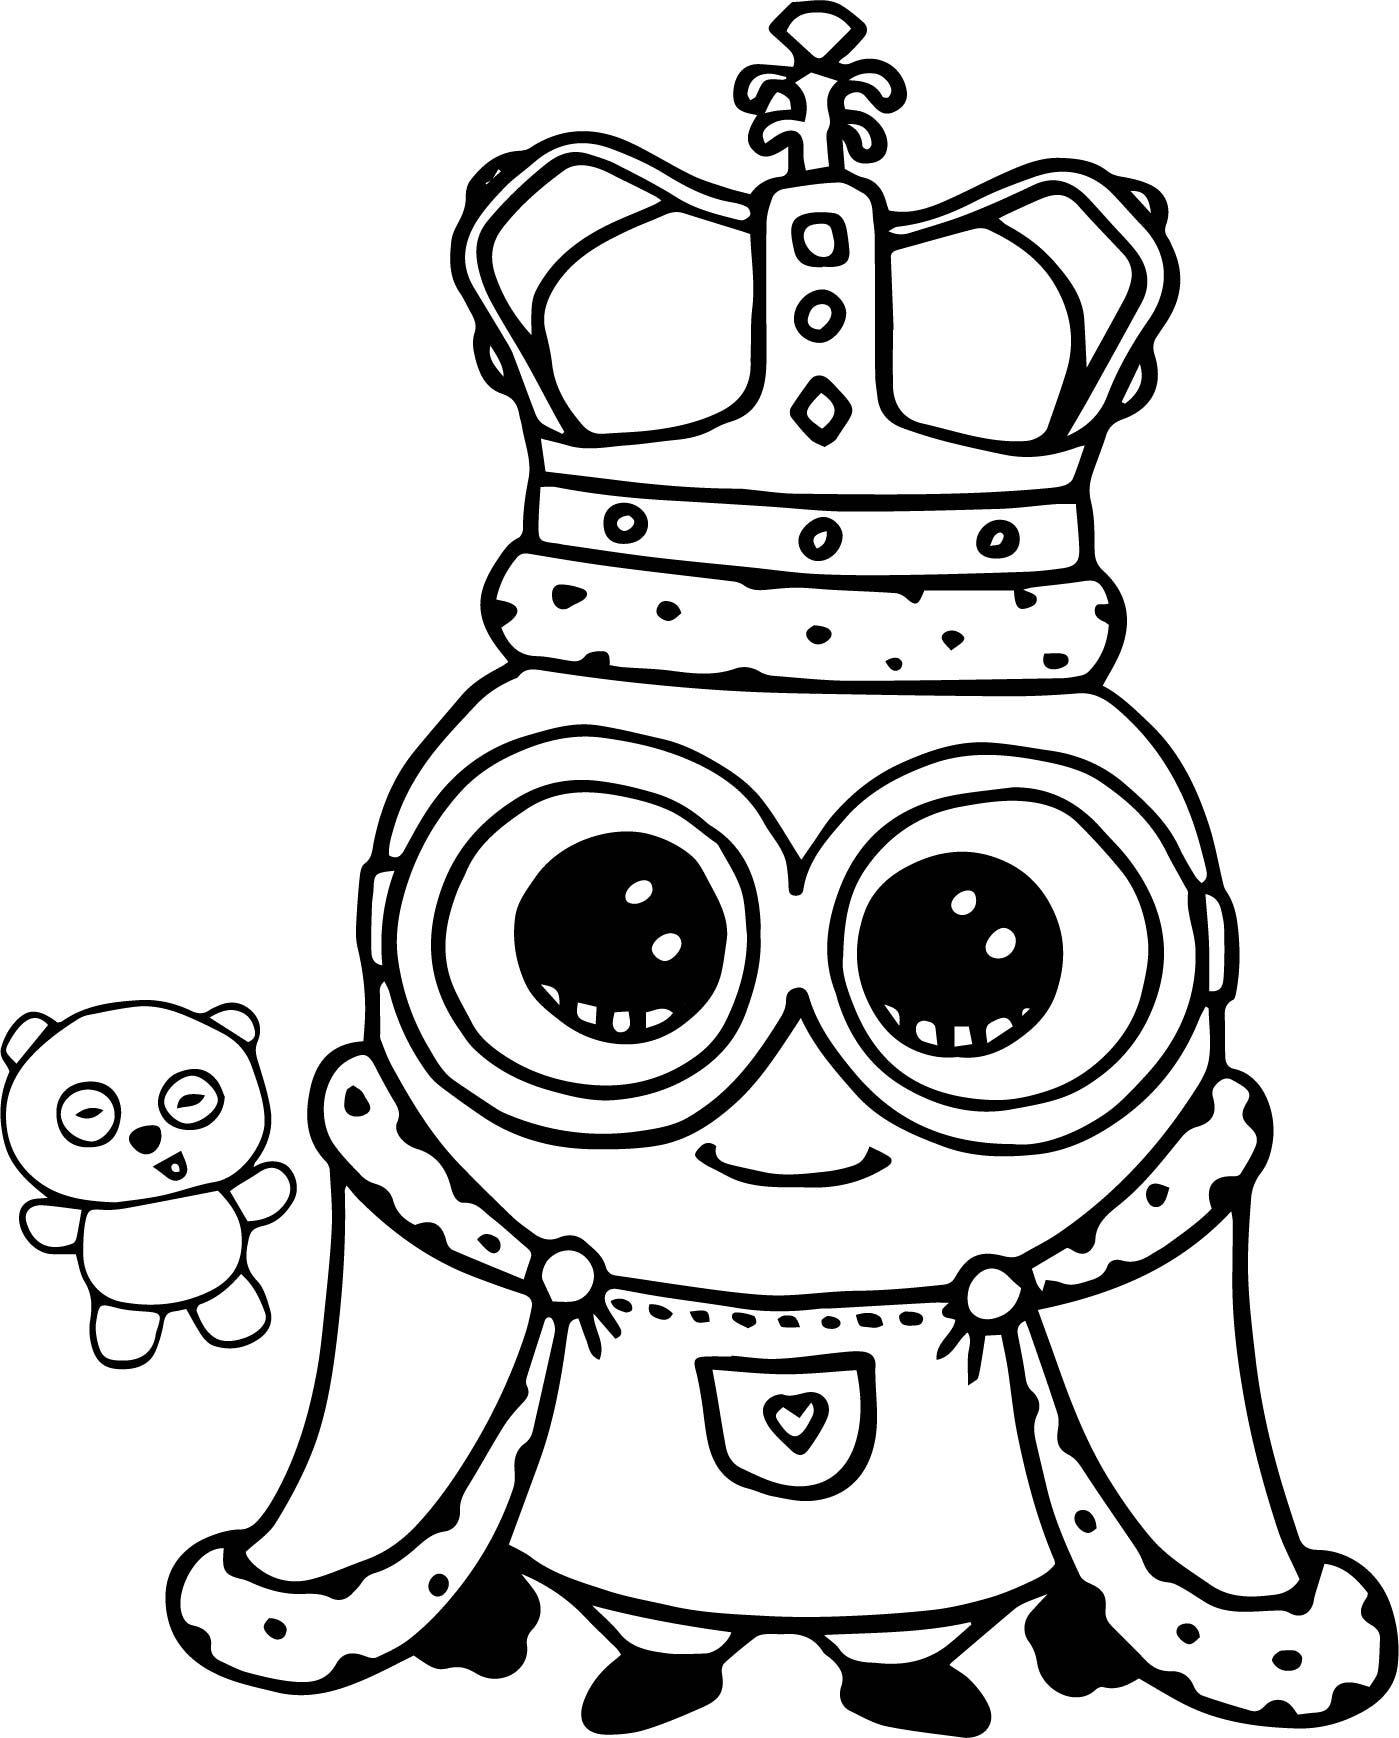 Nice Minion King Bob Cute Coloring Page Malvorlage Einhorn